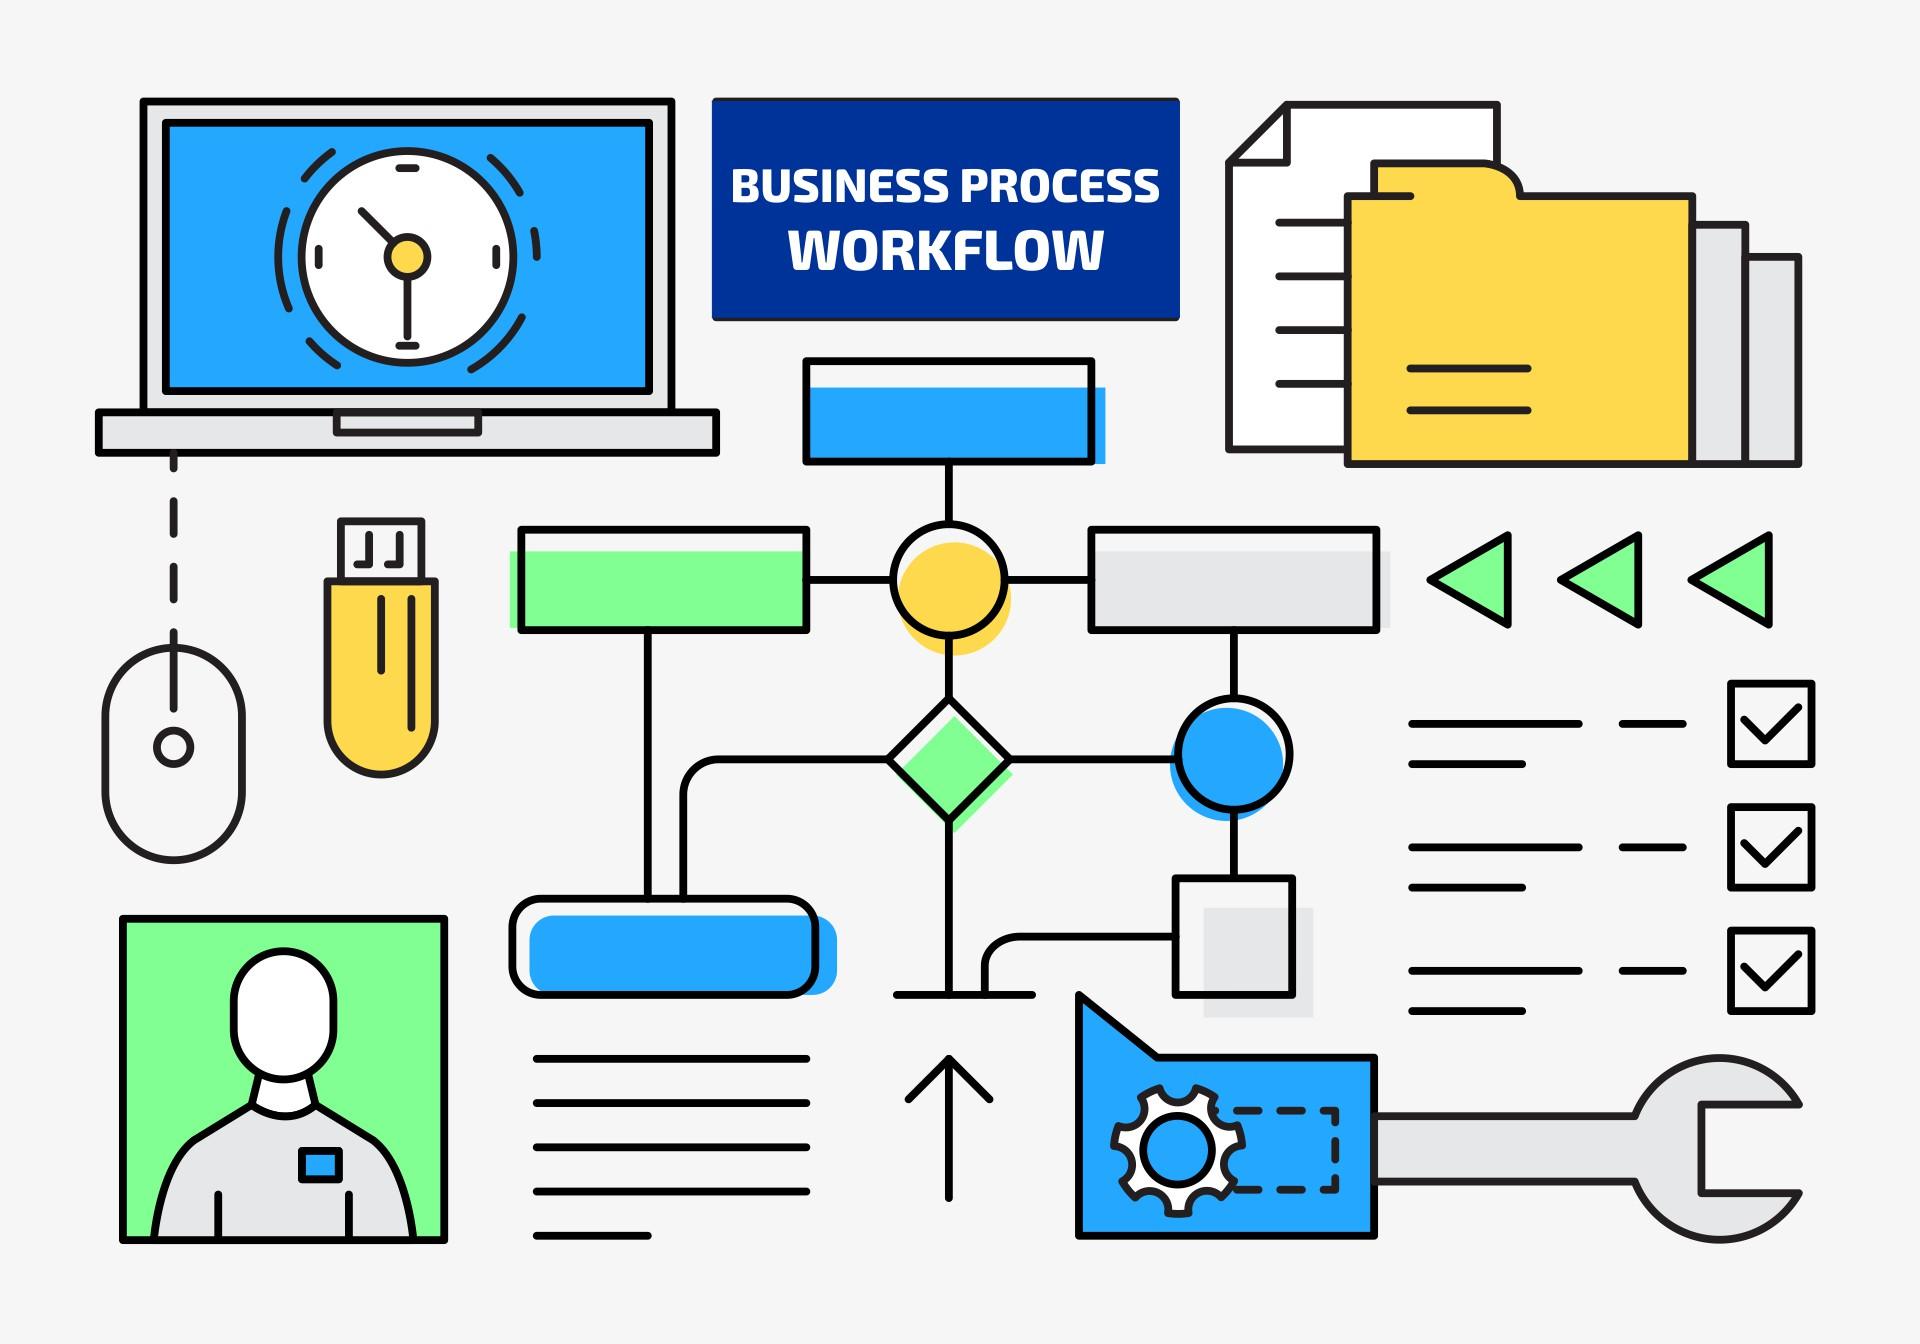 StartingPoint Customer Service Management